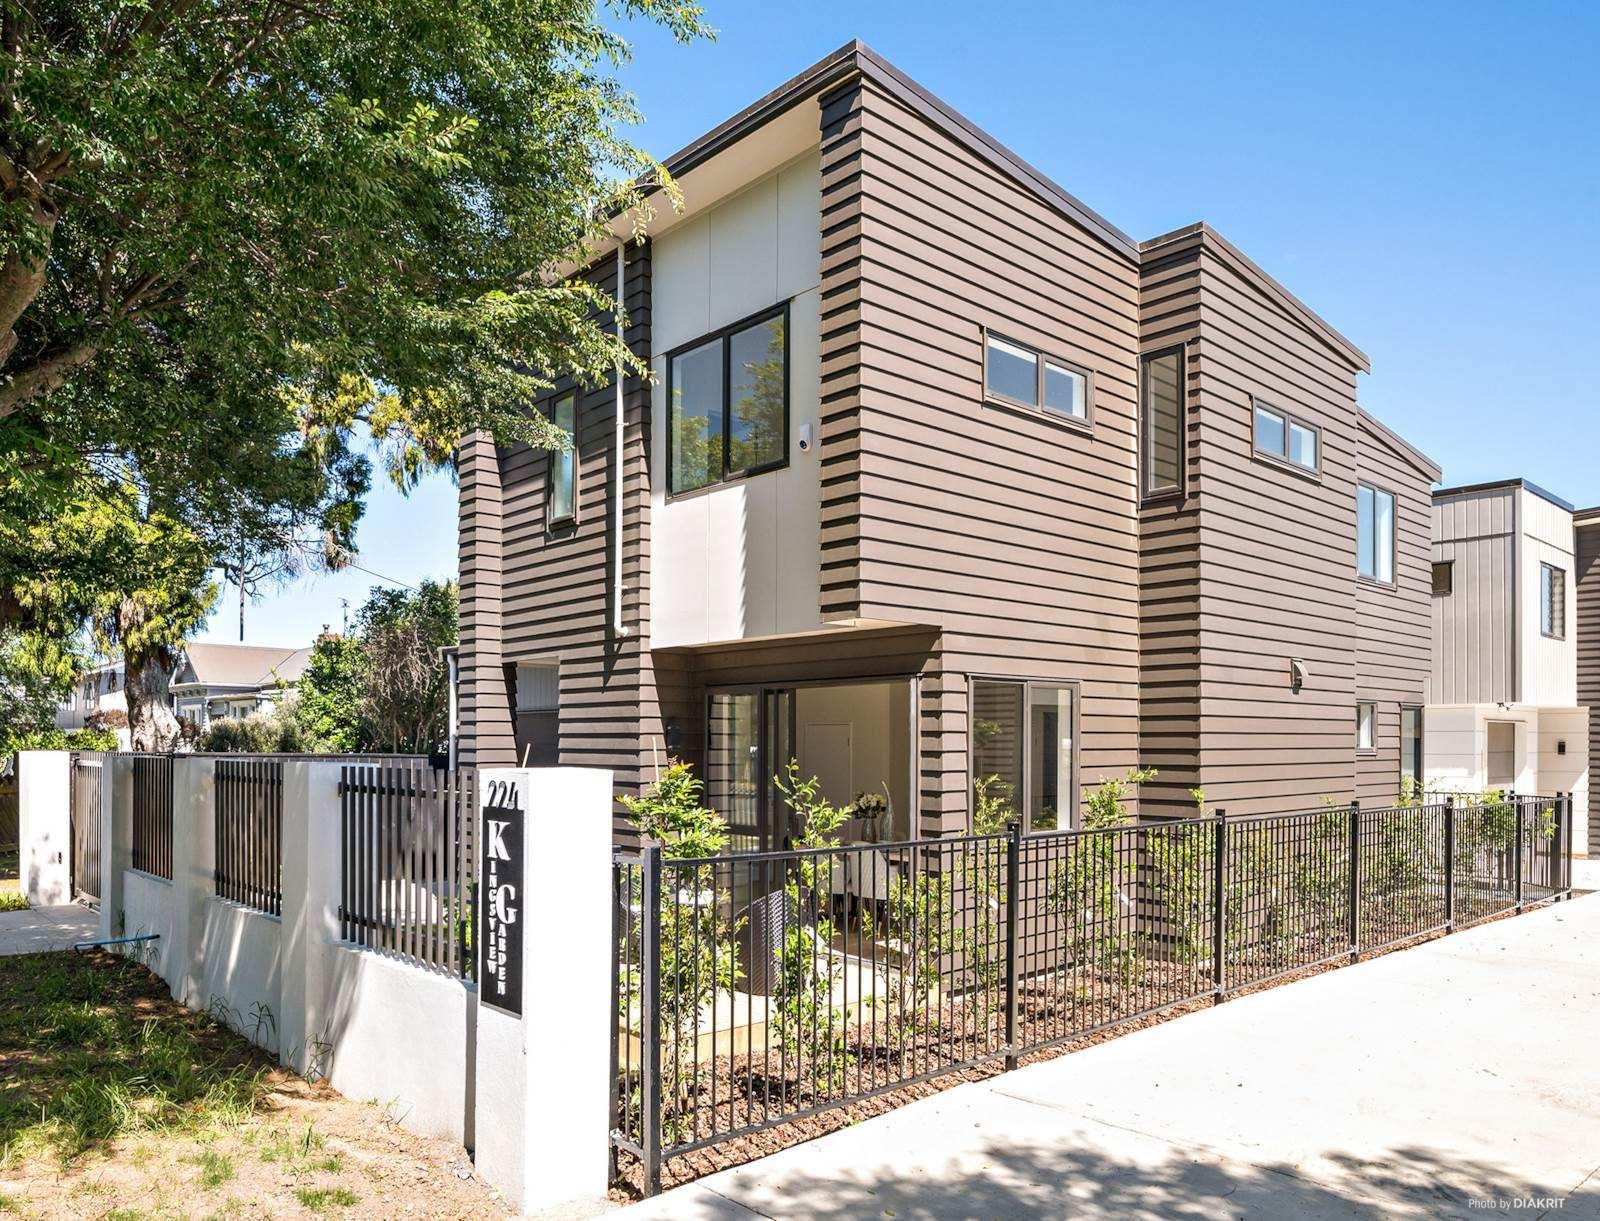 Otahuhu 3房 全新海滨美墅 亮点吸睛 步行2分钟至海滩 靠近Syliva Park & CBD 自住&投资两相宜! Brand New Waterfront House - Walk to the Beach!